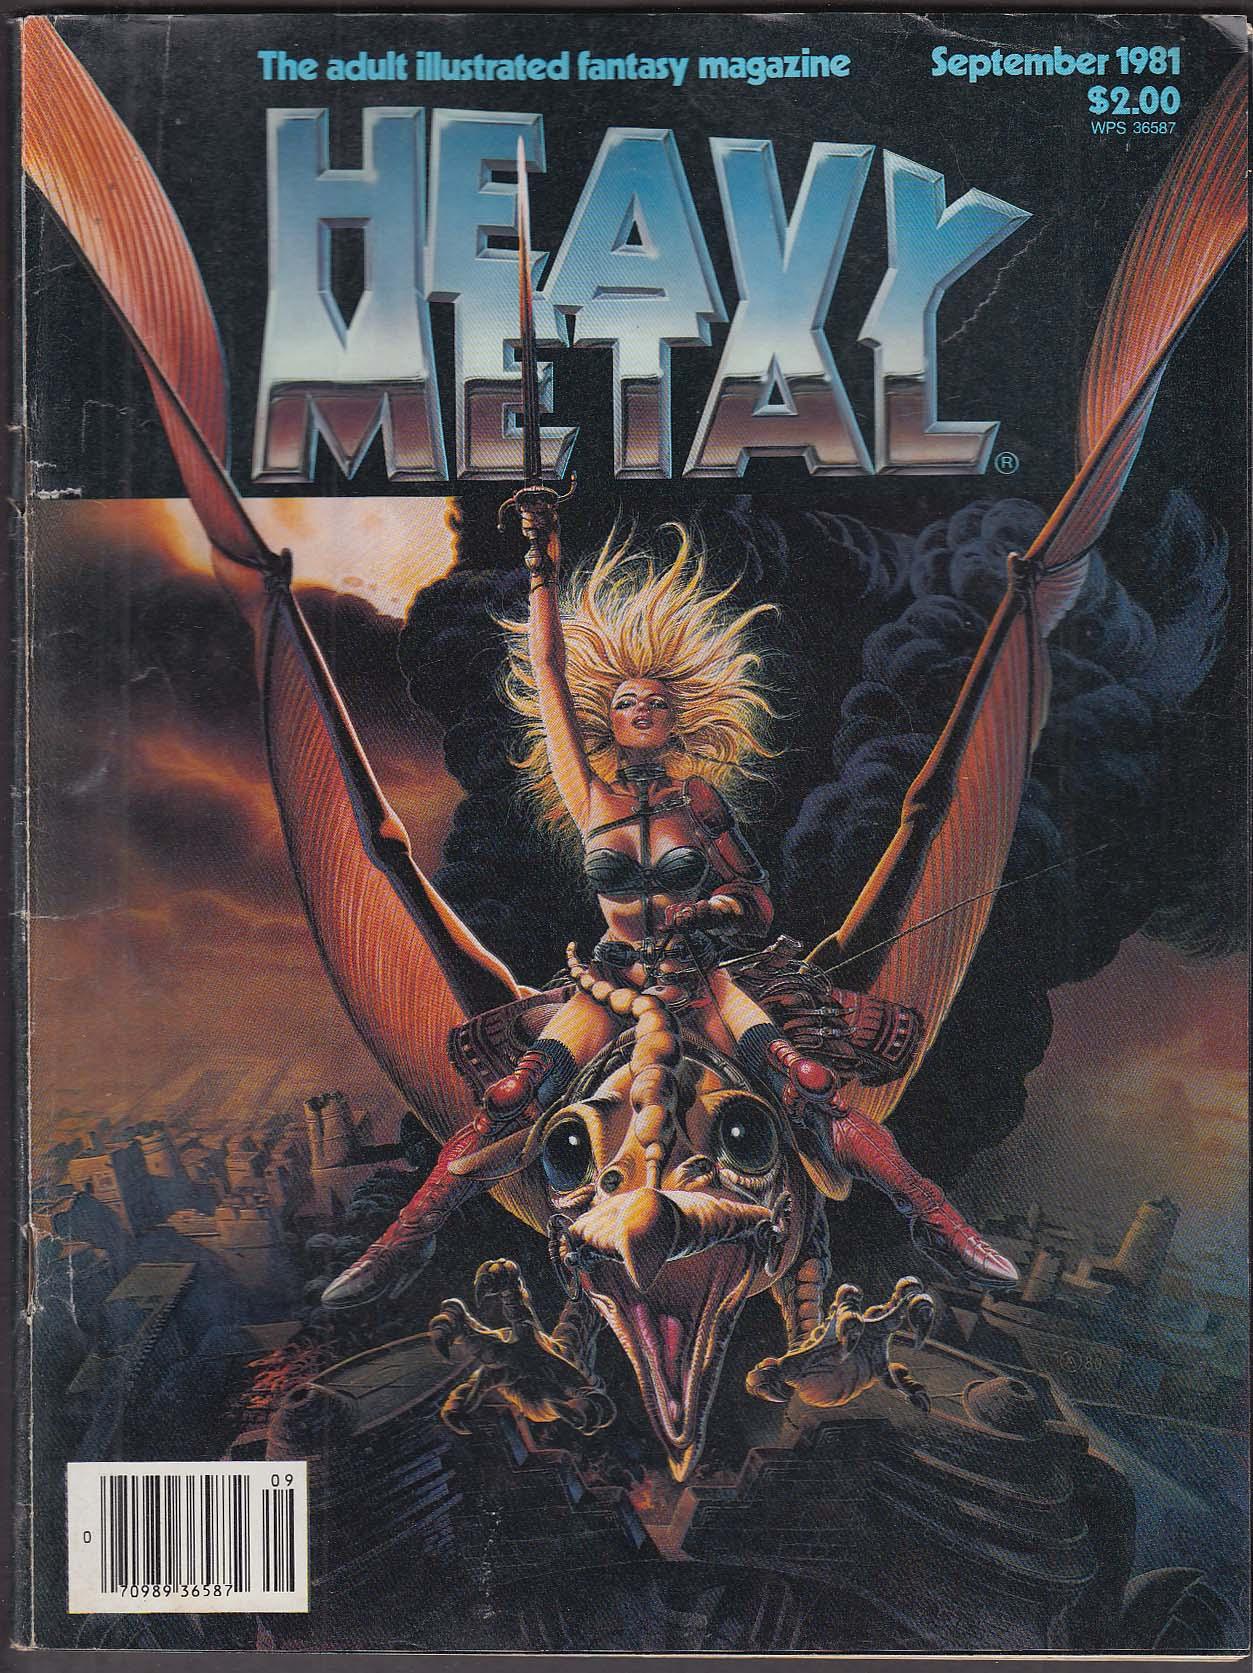 HEAVY METAL Taarna Richard Corben Enki Bilal Juan Gimenez Jim Steranko ++ 9 1981